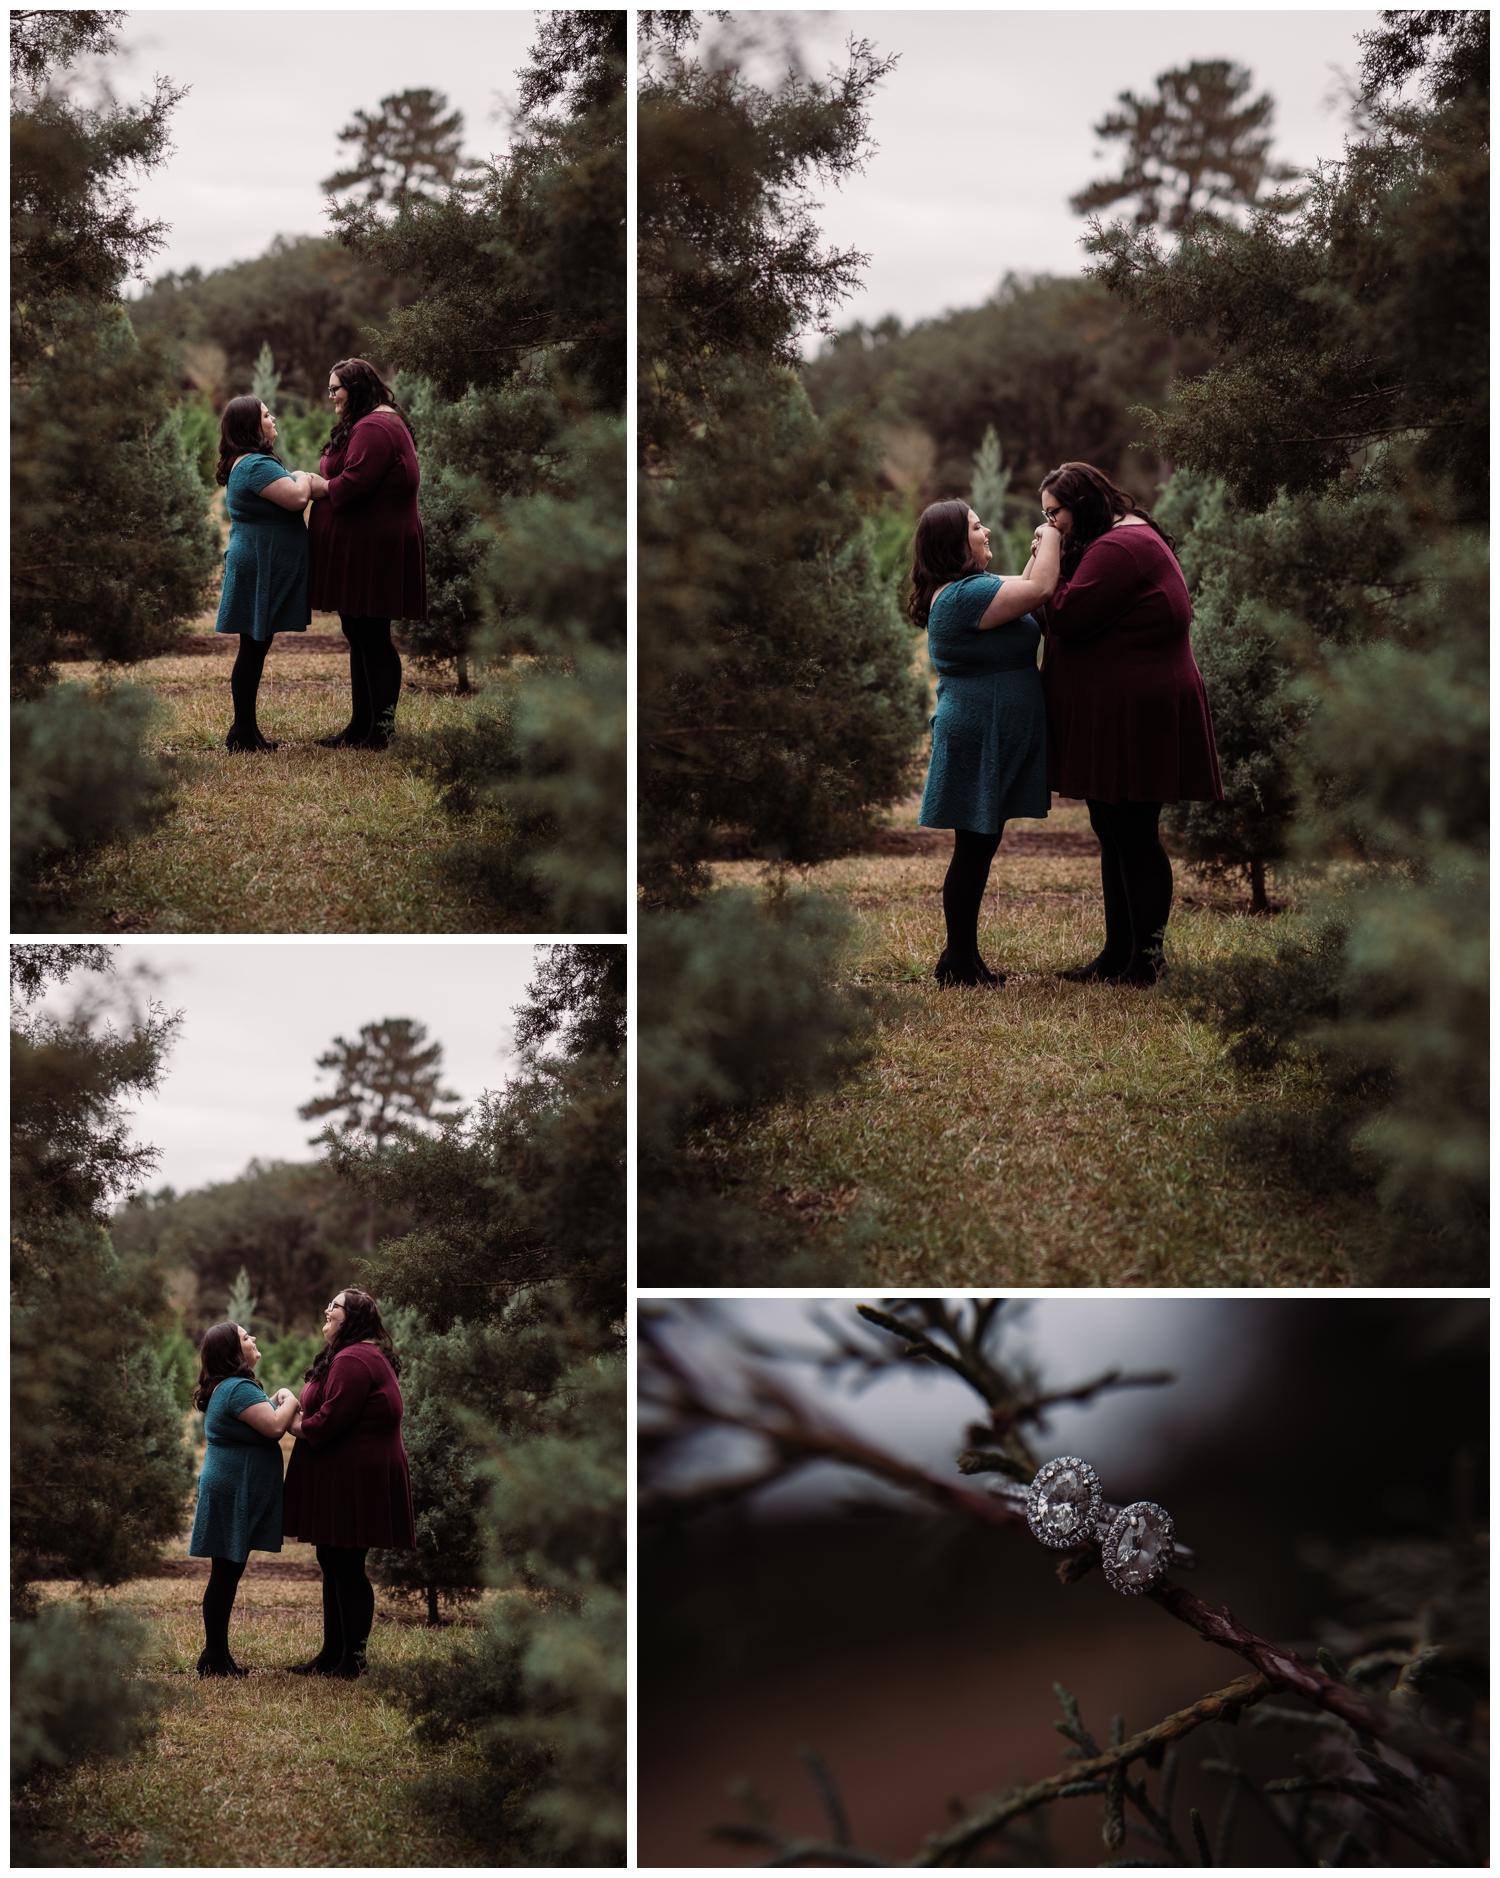 Top-New-Orleans-Wesdding-Photographer-Chirstmas-Tree-Farm-Engagement-Shoot--KallistiaPhotography_0003.jpg